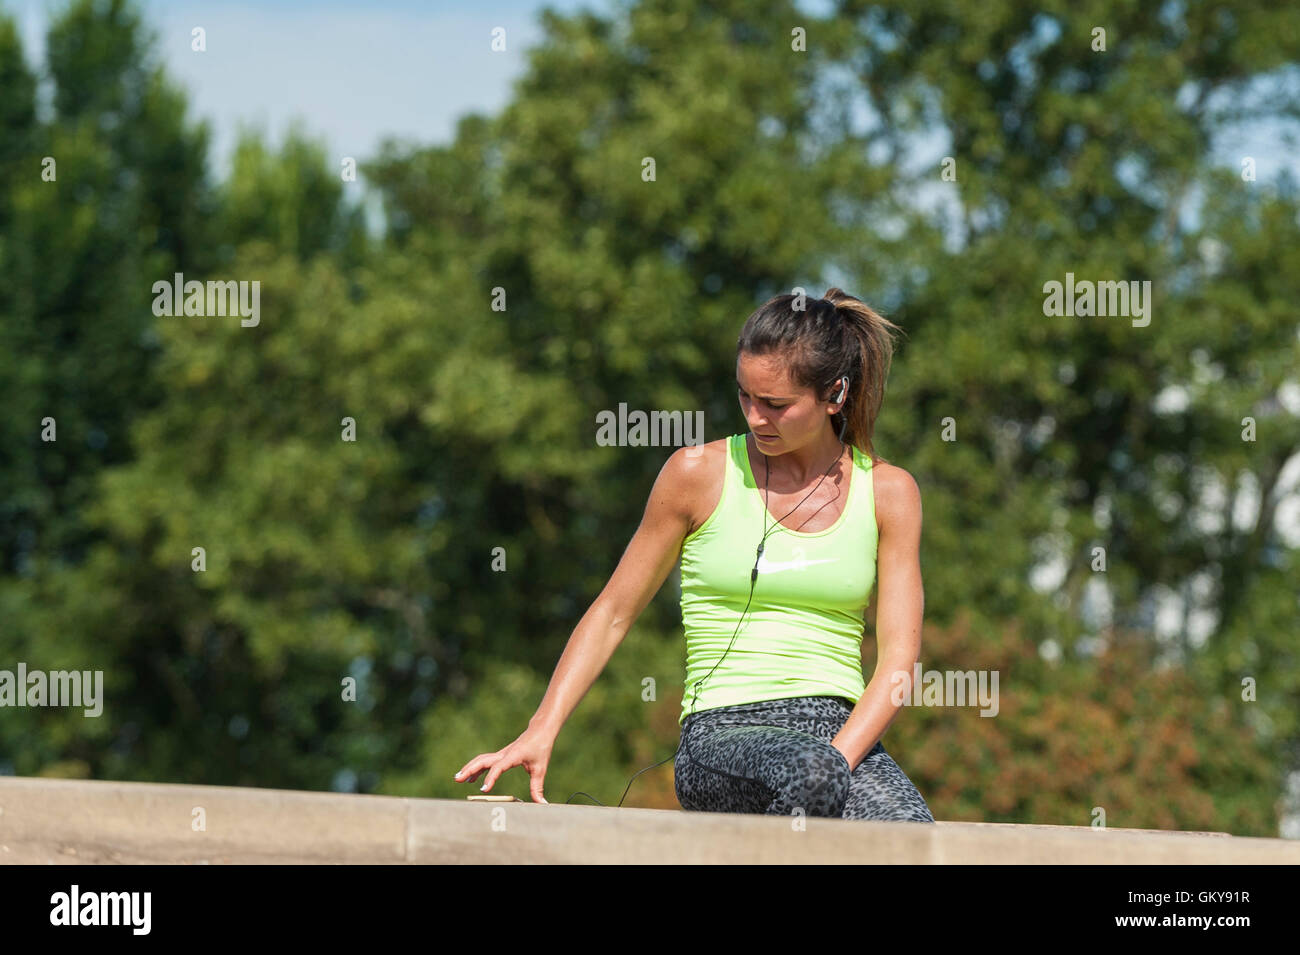 London, UK.  24 August 2016.  A sunbather enjoys the sunshine on Primrose Hill as a mini heatwave brings sunshine - Stock Image